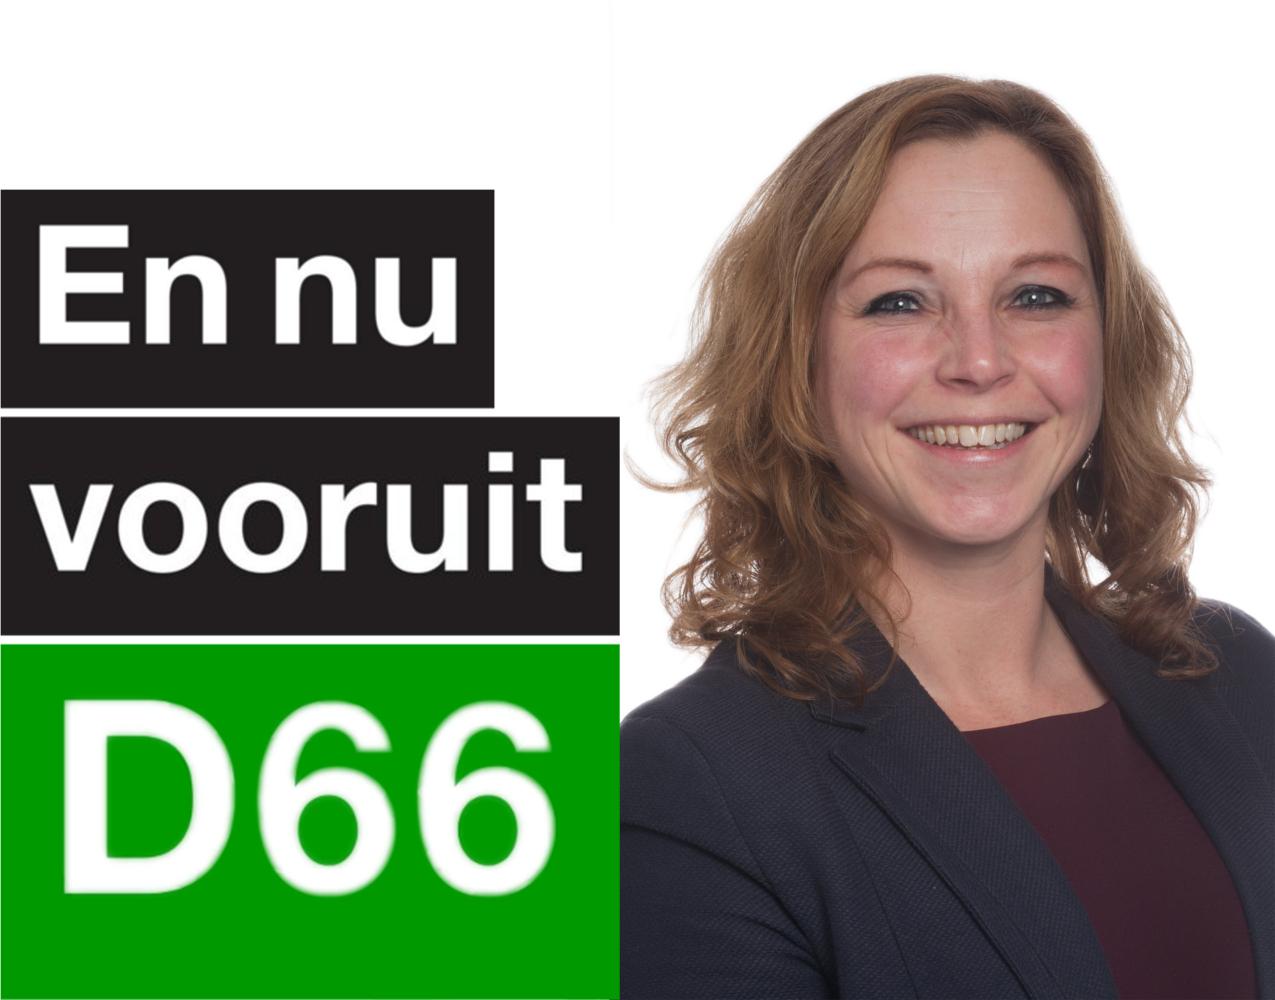 Chantal Kouwenberg